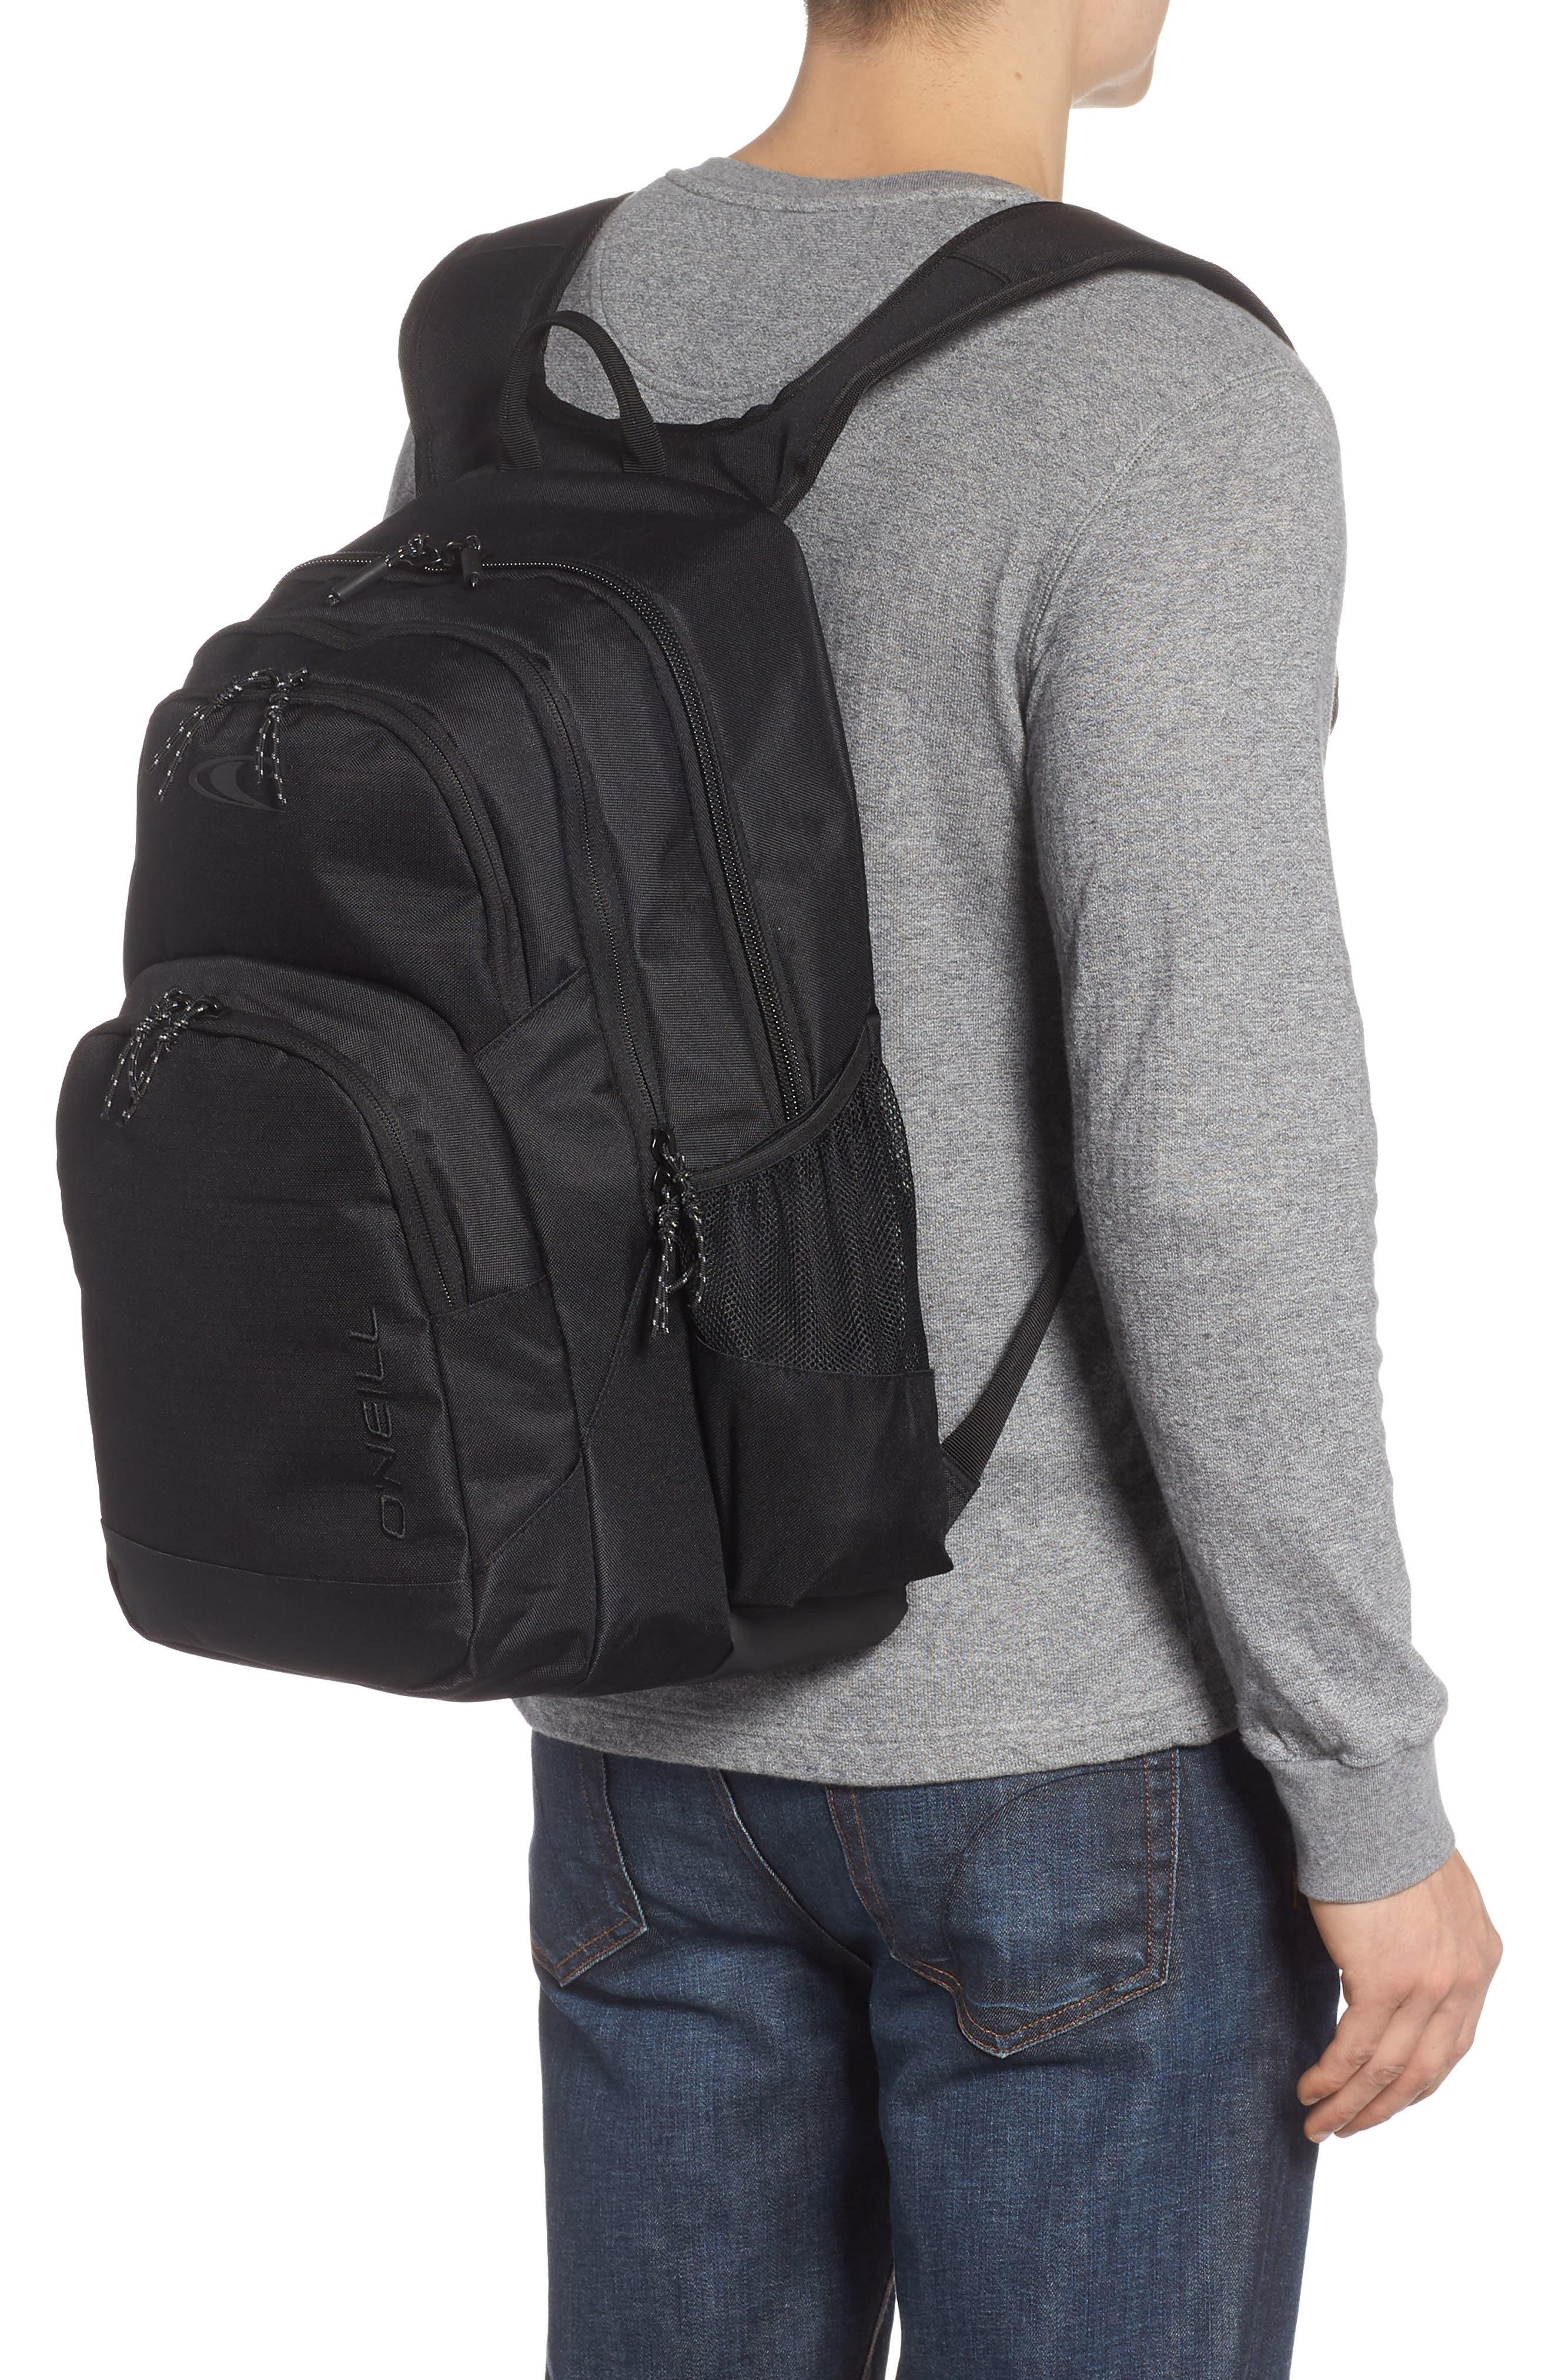 Traverse Backpack,                             Alternate thumbnail 2, color,                             001